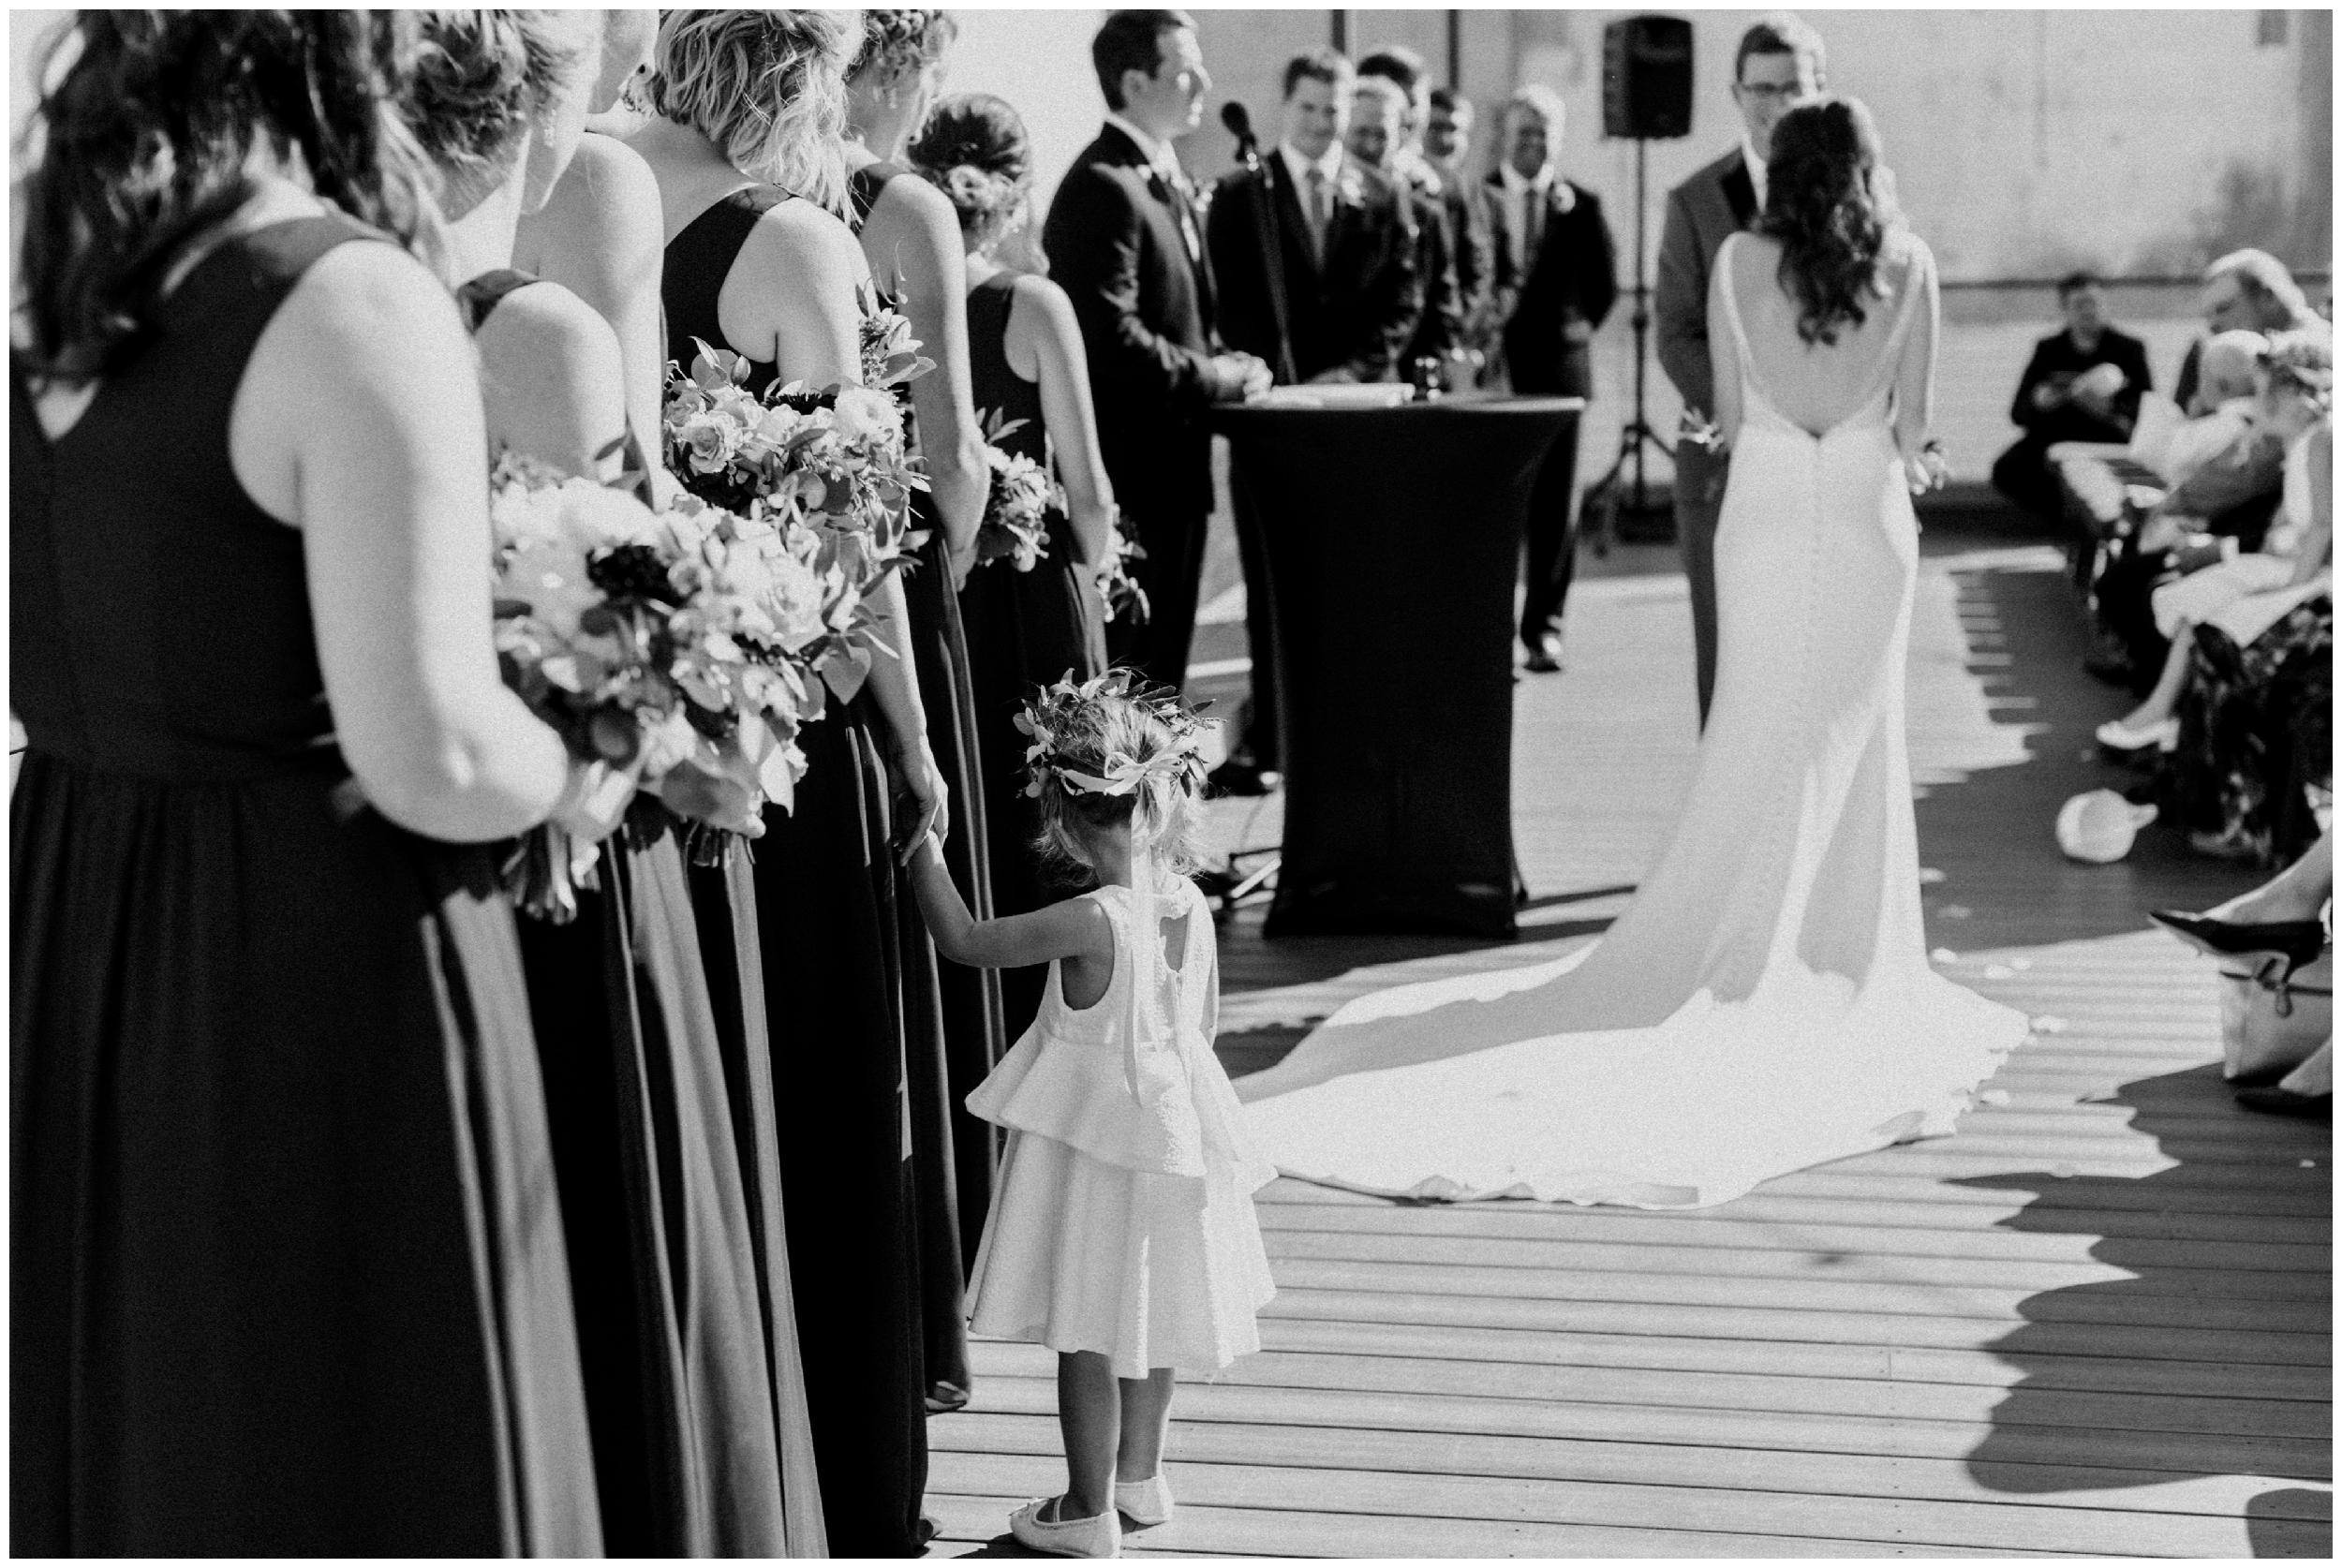 Flower girl at Duluth, Minnesota wedding ceremony